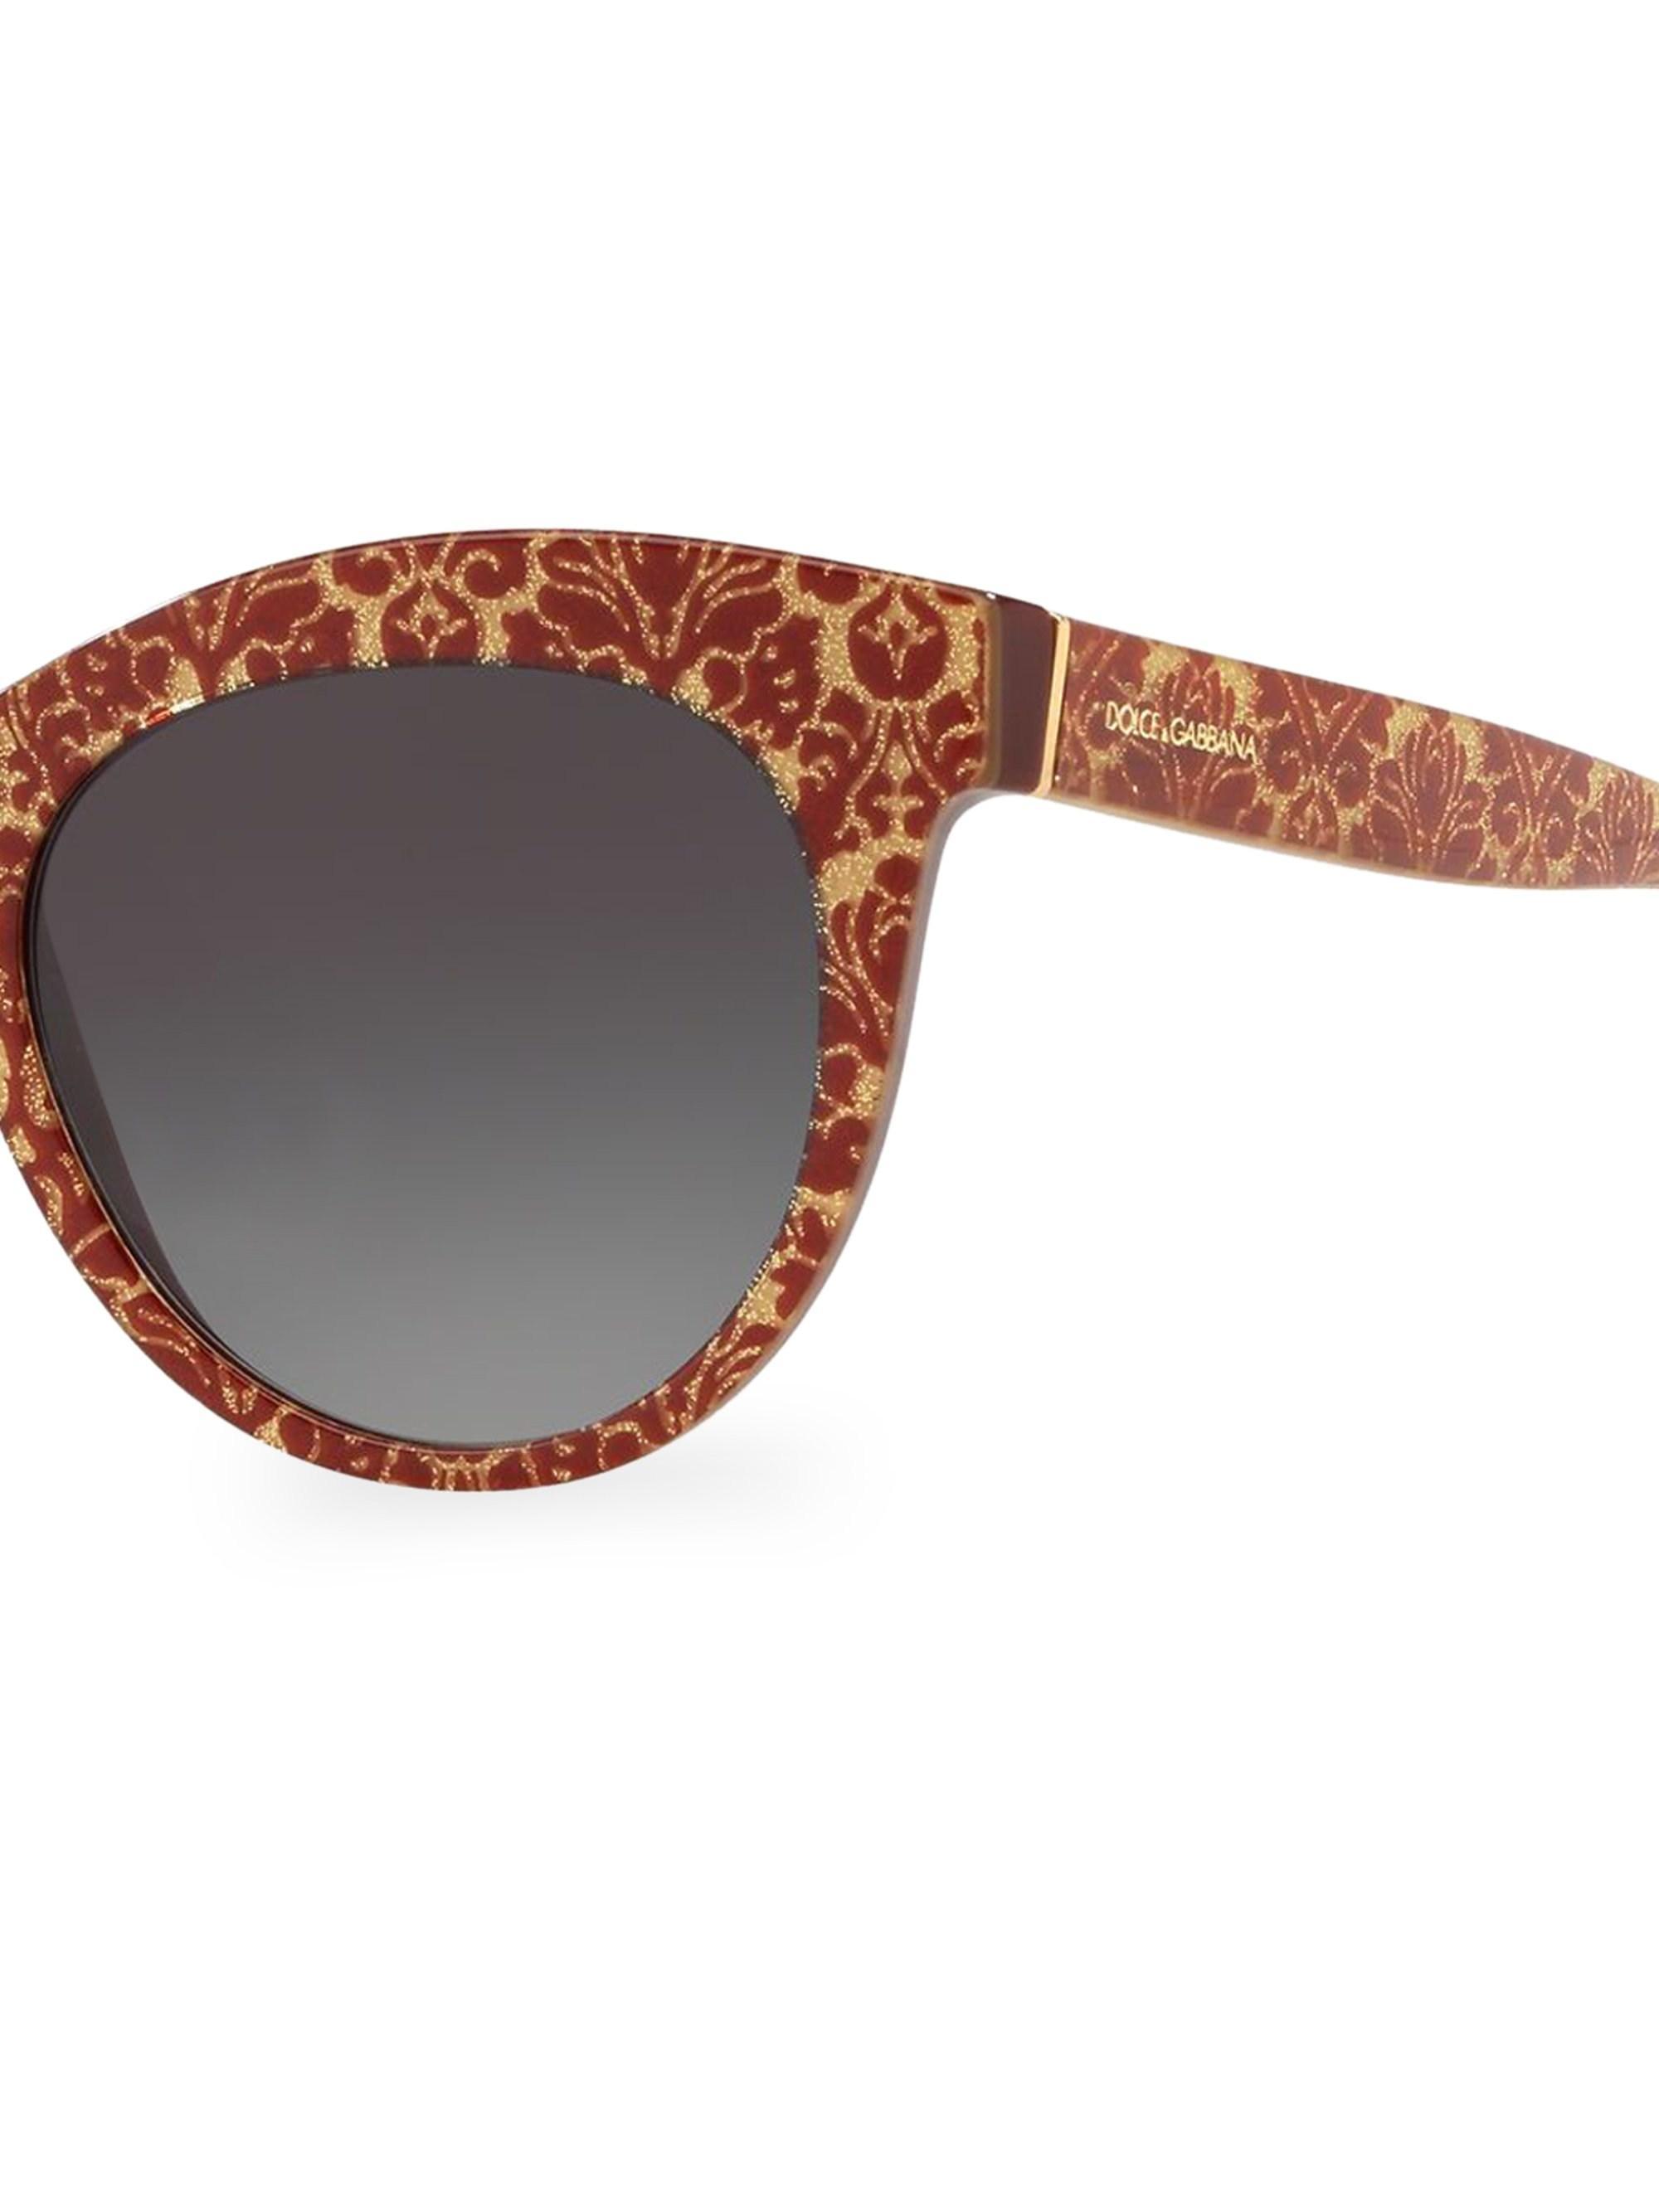 740931e3b22 Lyst - Dolce   Gabbana Women s Dg4311 Glitter Floral 51mm Cat Eye ...